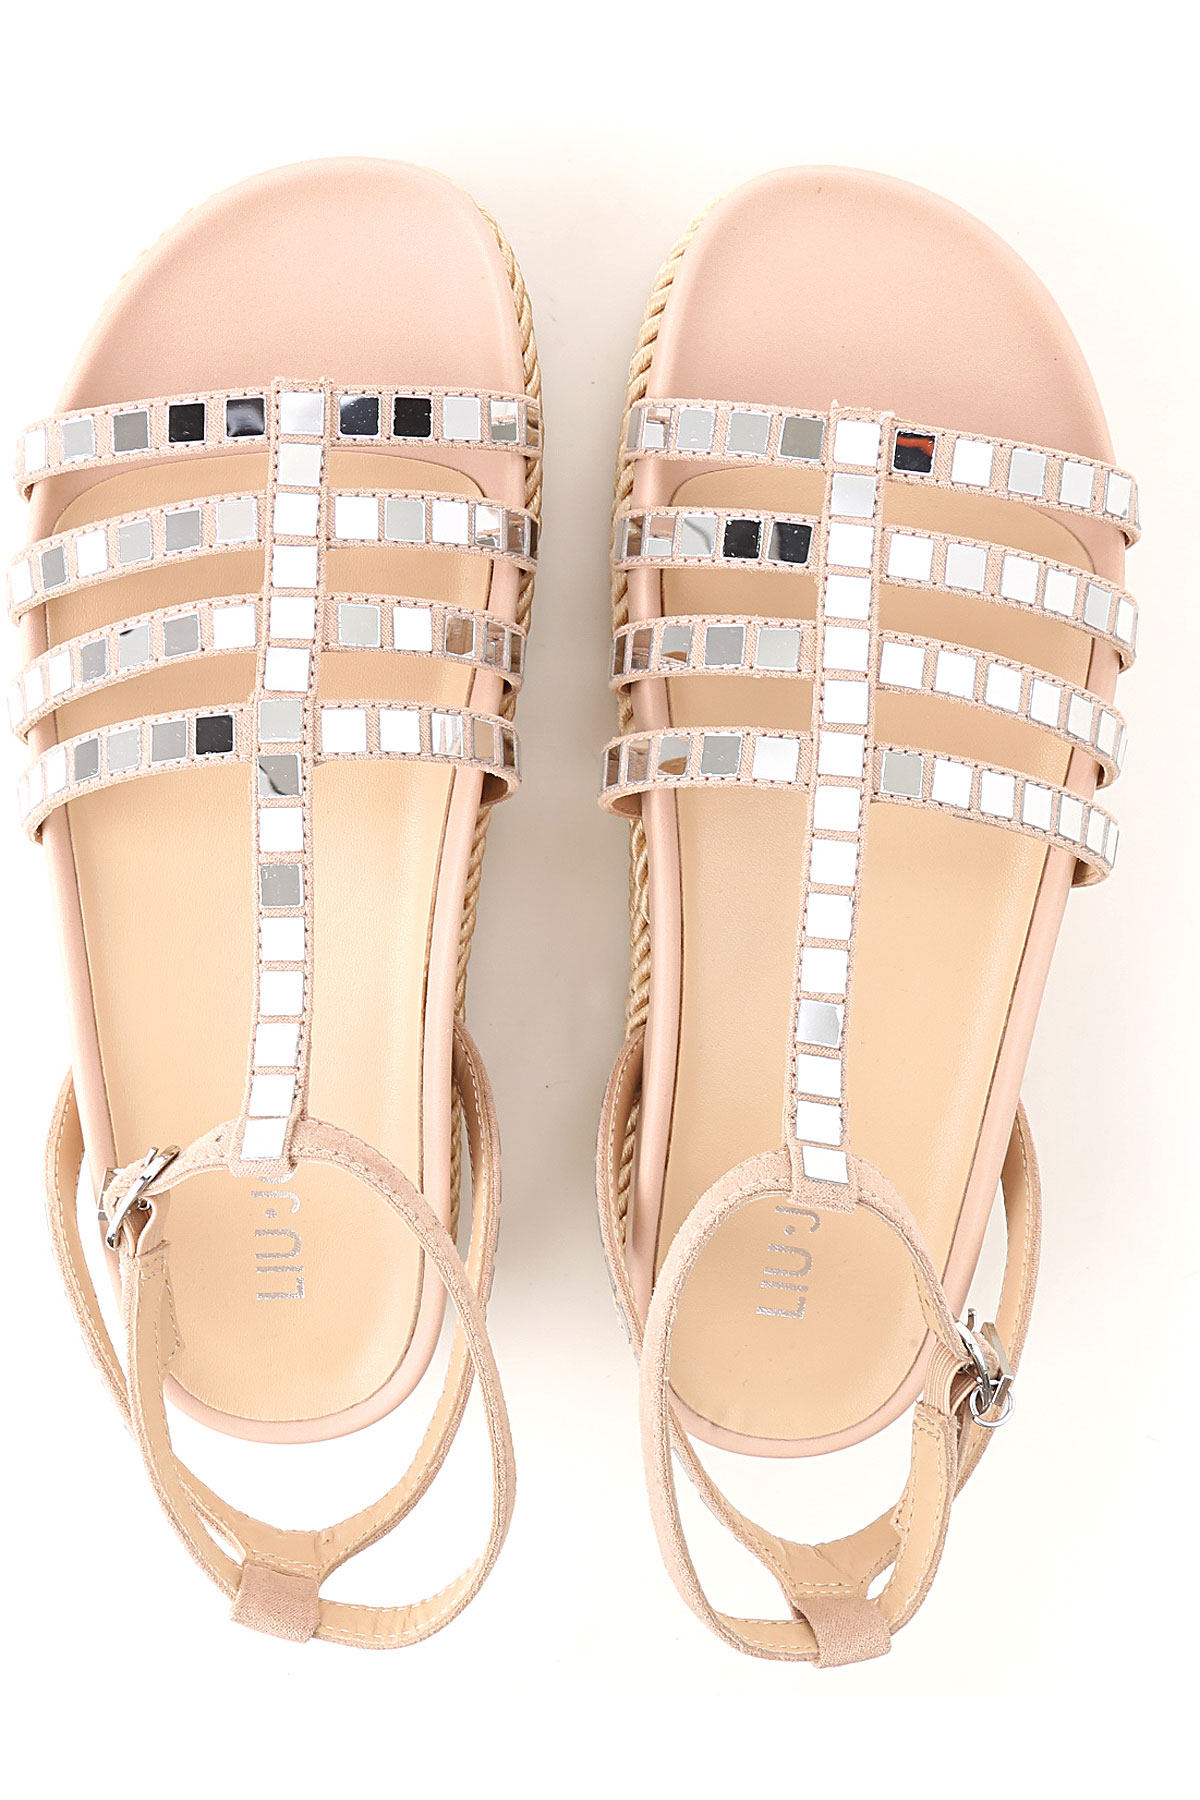 Mujer Rosa Plata 2019 Suave Primavera Liu Para verano Jo Zapatos q6U0wtA